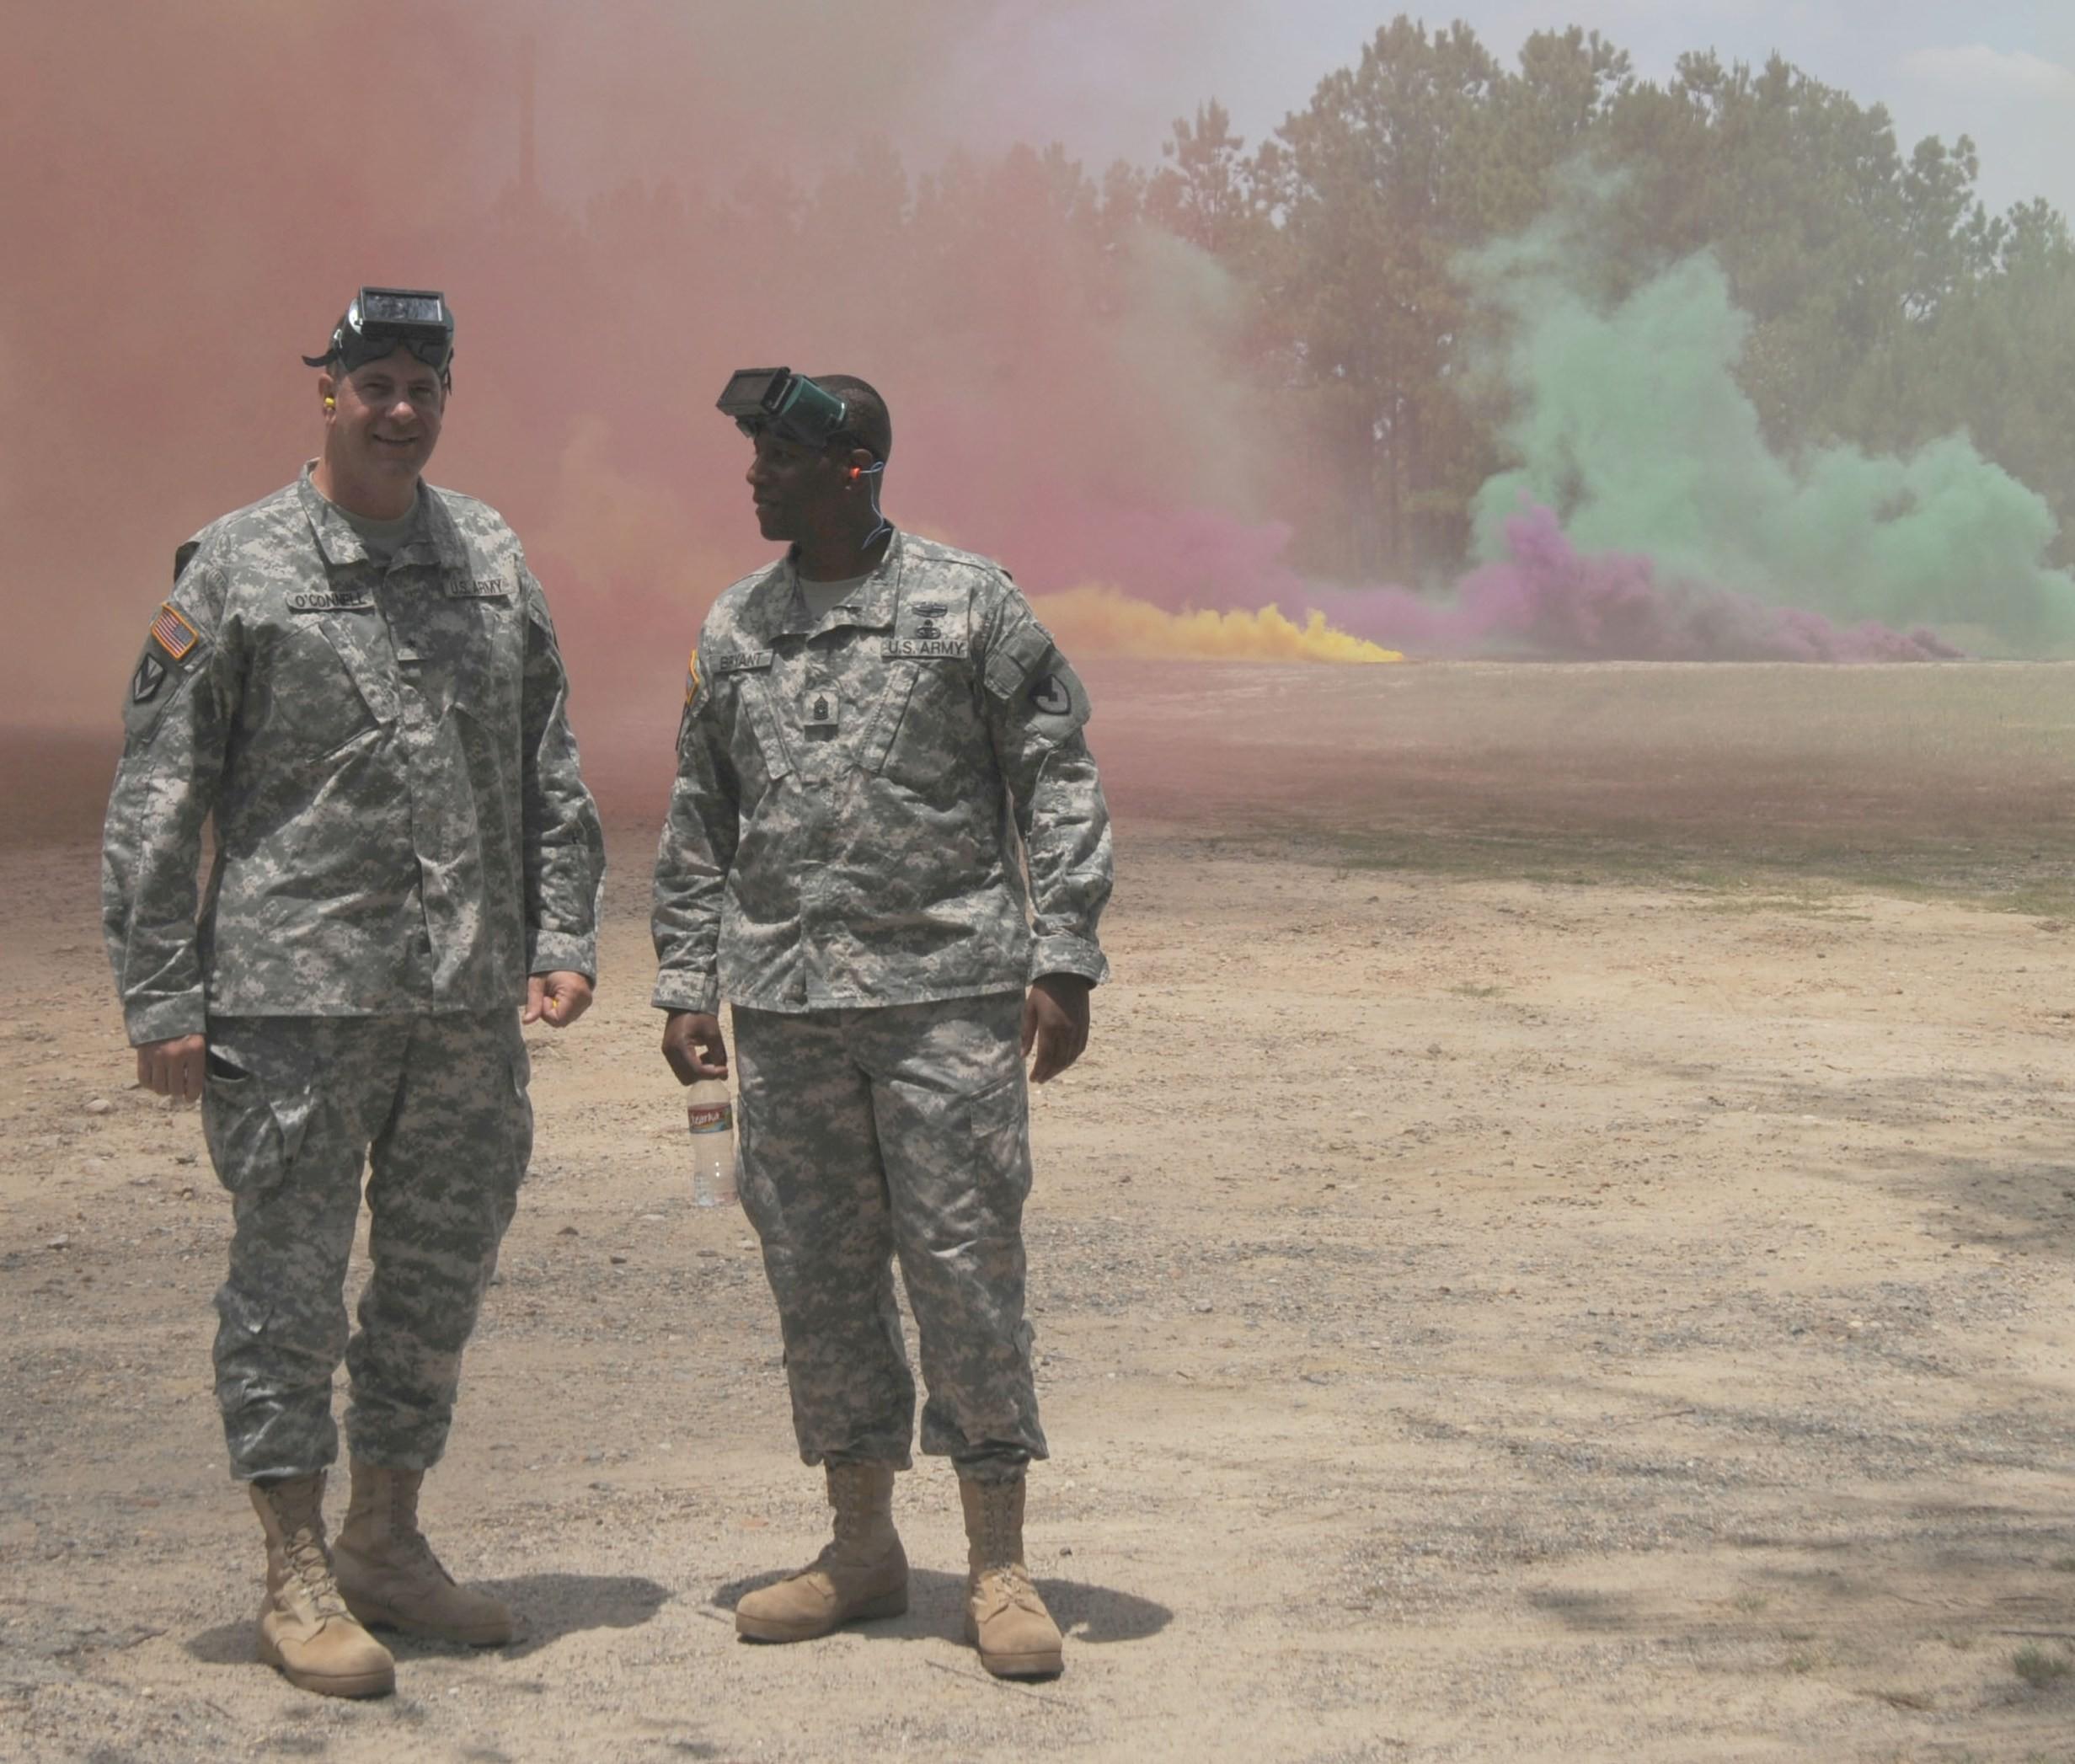 JMC commanding general visits Pine Bluff Arsenal | Article | The